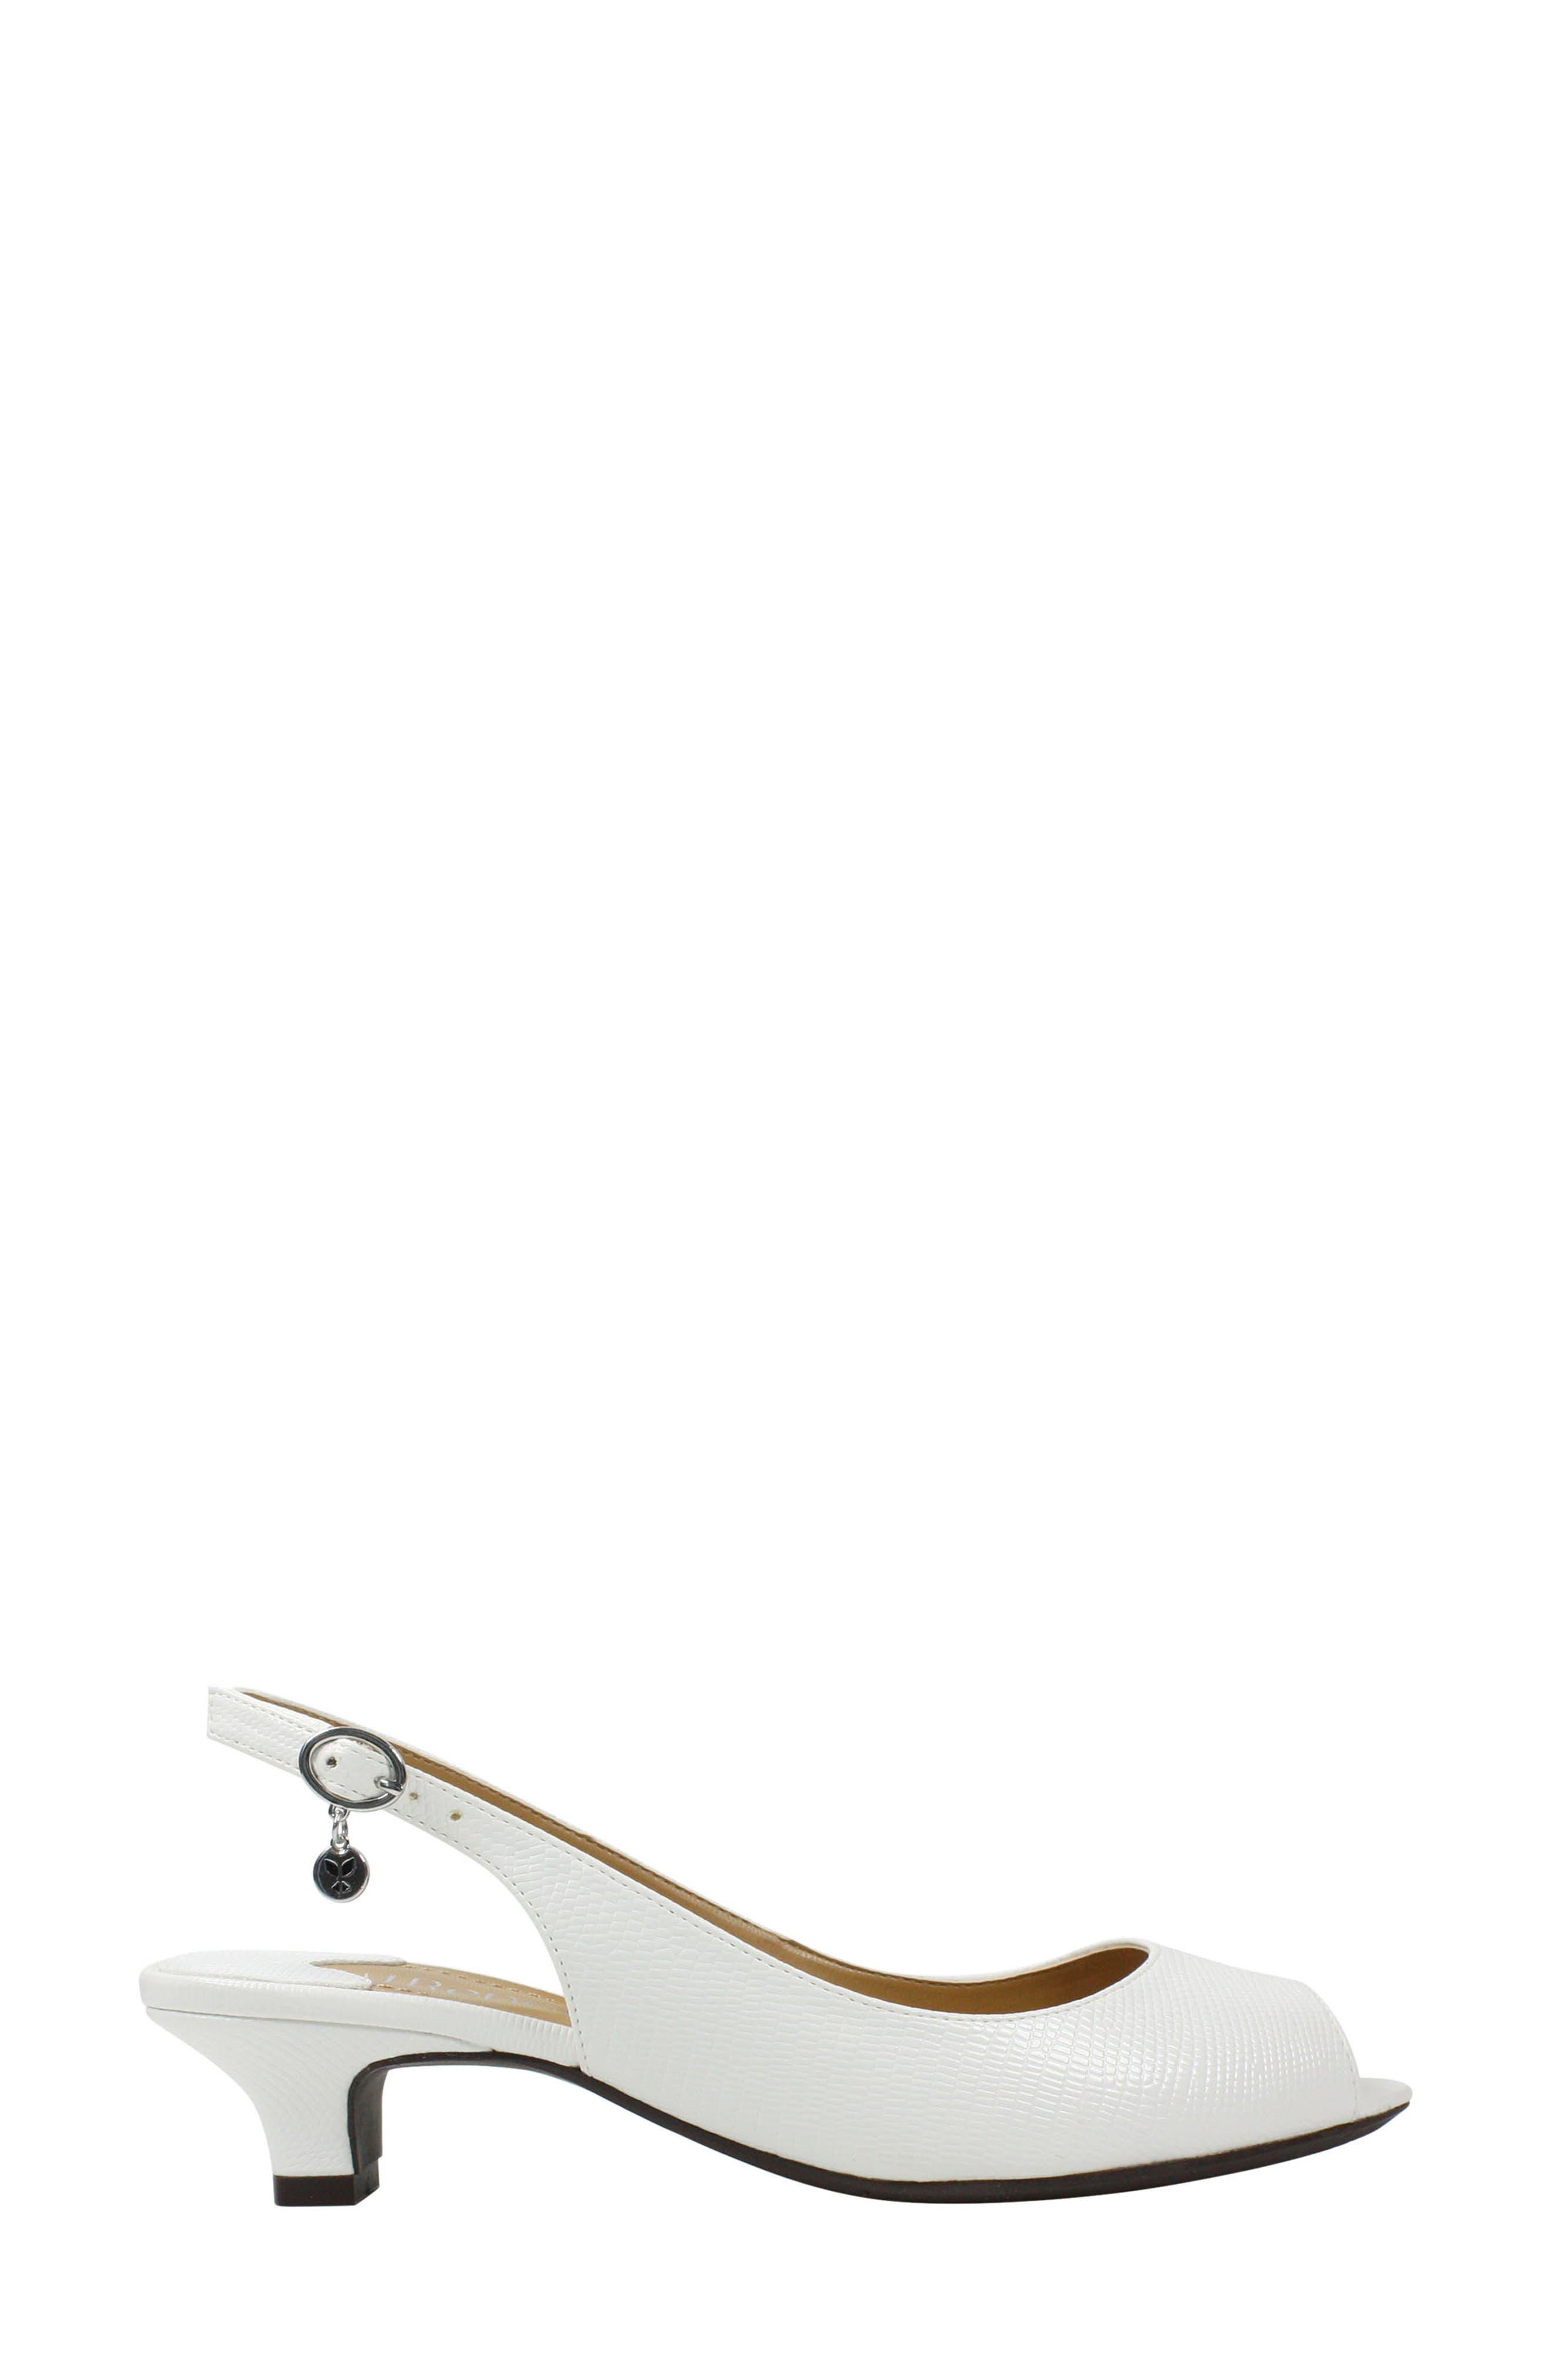 Jenvey Slingback Sandal,                             Alternate thumbnail 3, color,                             WHITE LIZARD PRINT